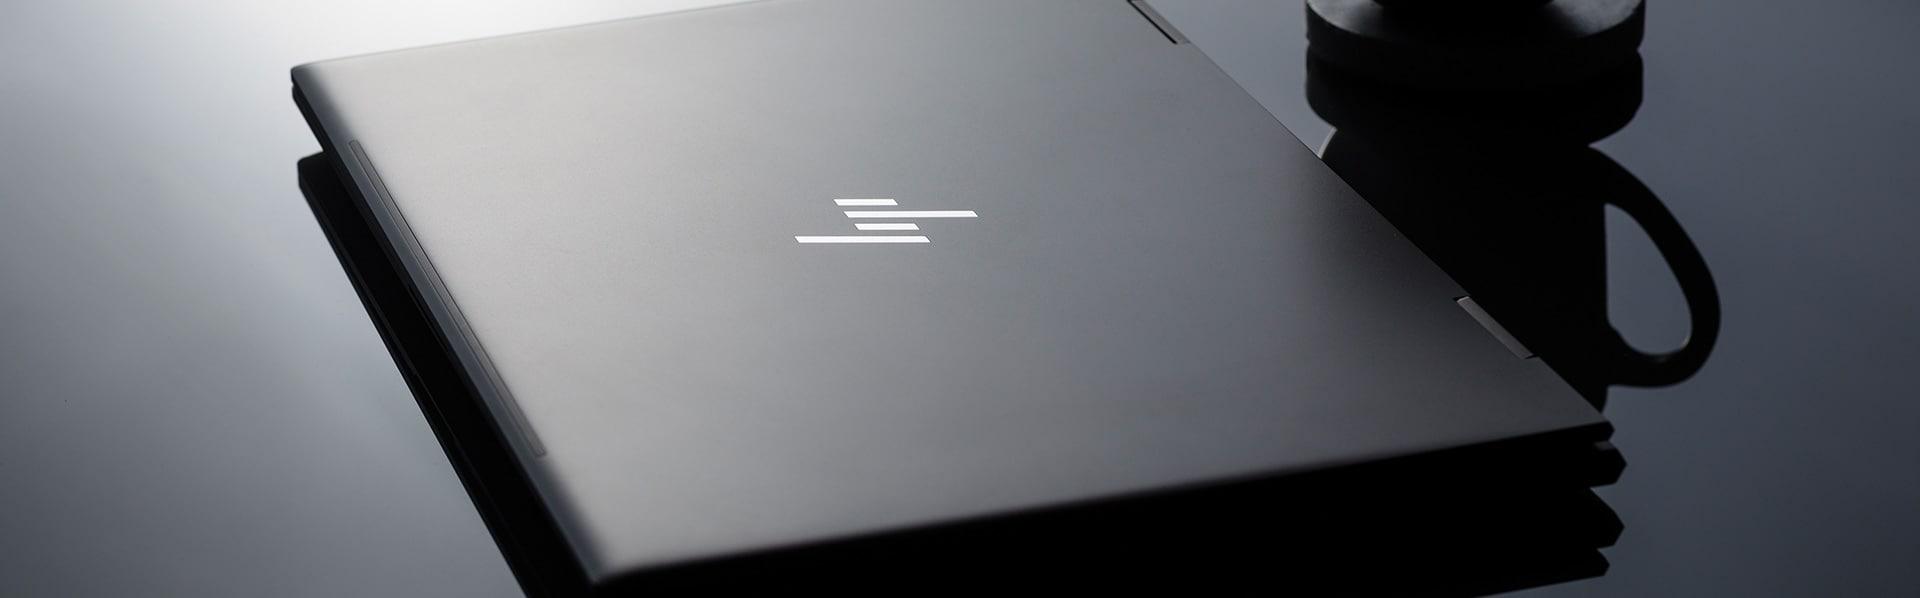 Refurbished: HP ENVY x360 13m-ag0001dx 2-in-1 Laptop AMD Ryzen 5 2500U 2 00  GHz 13 3